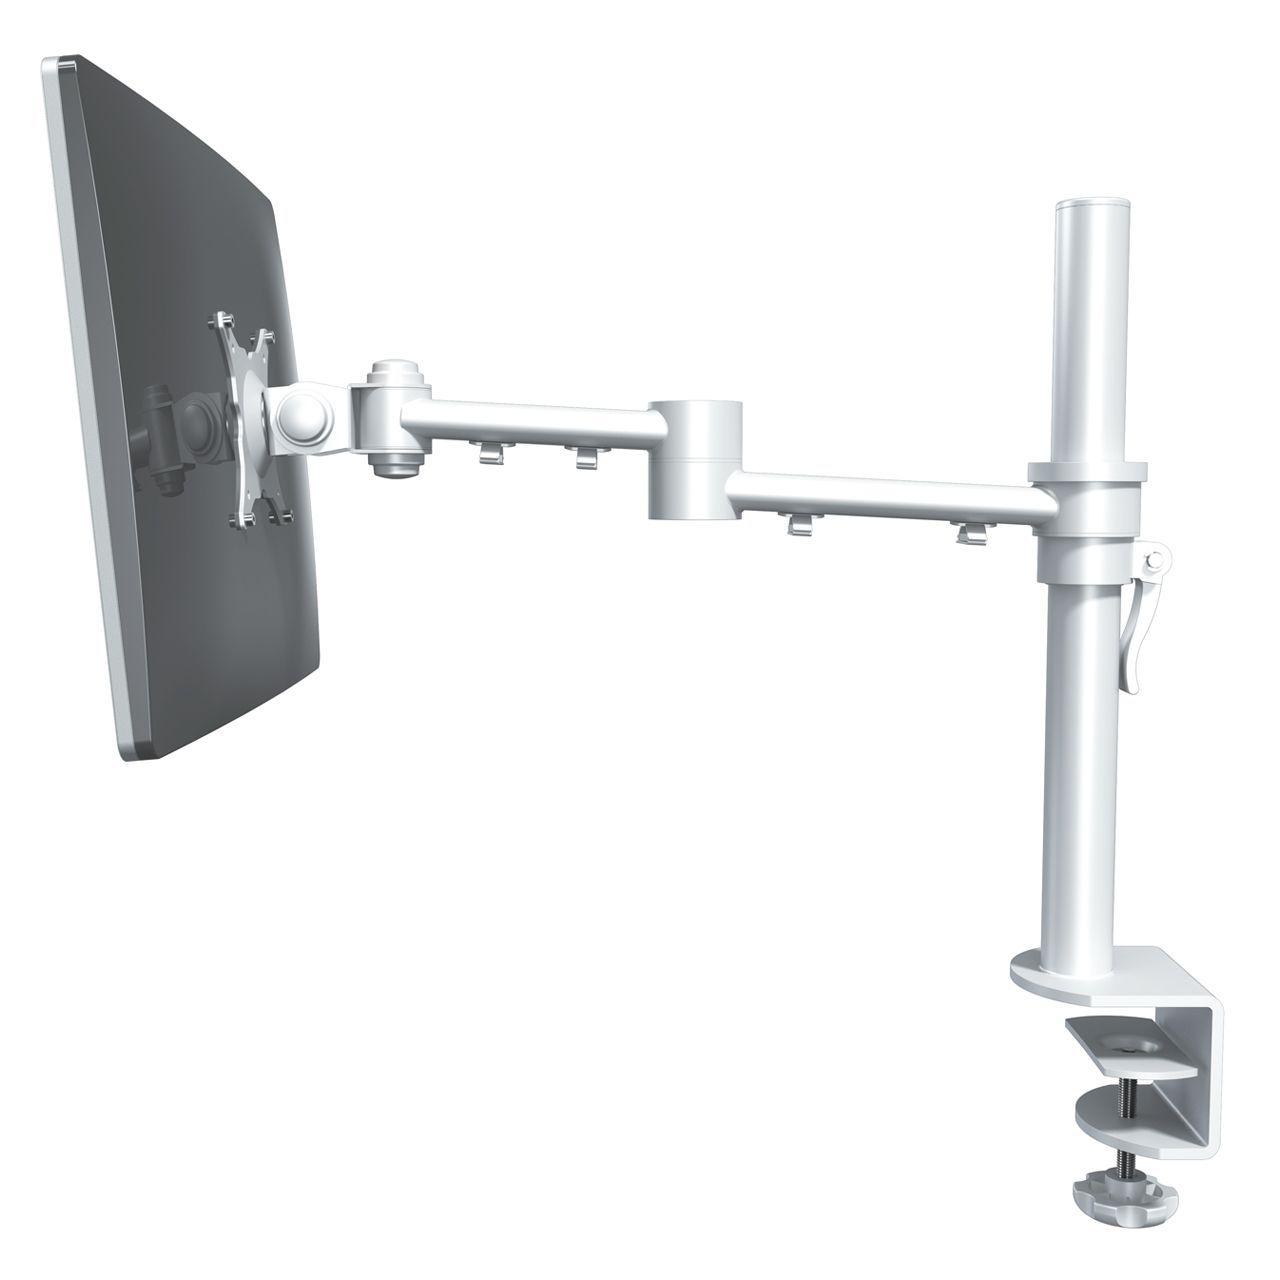 viewmate ecoline monitorarm flatscreen en monitorsteunen ERKAVME01 Zijkant